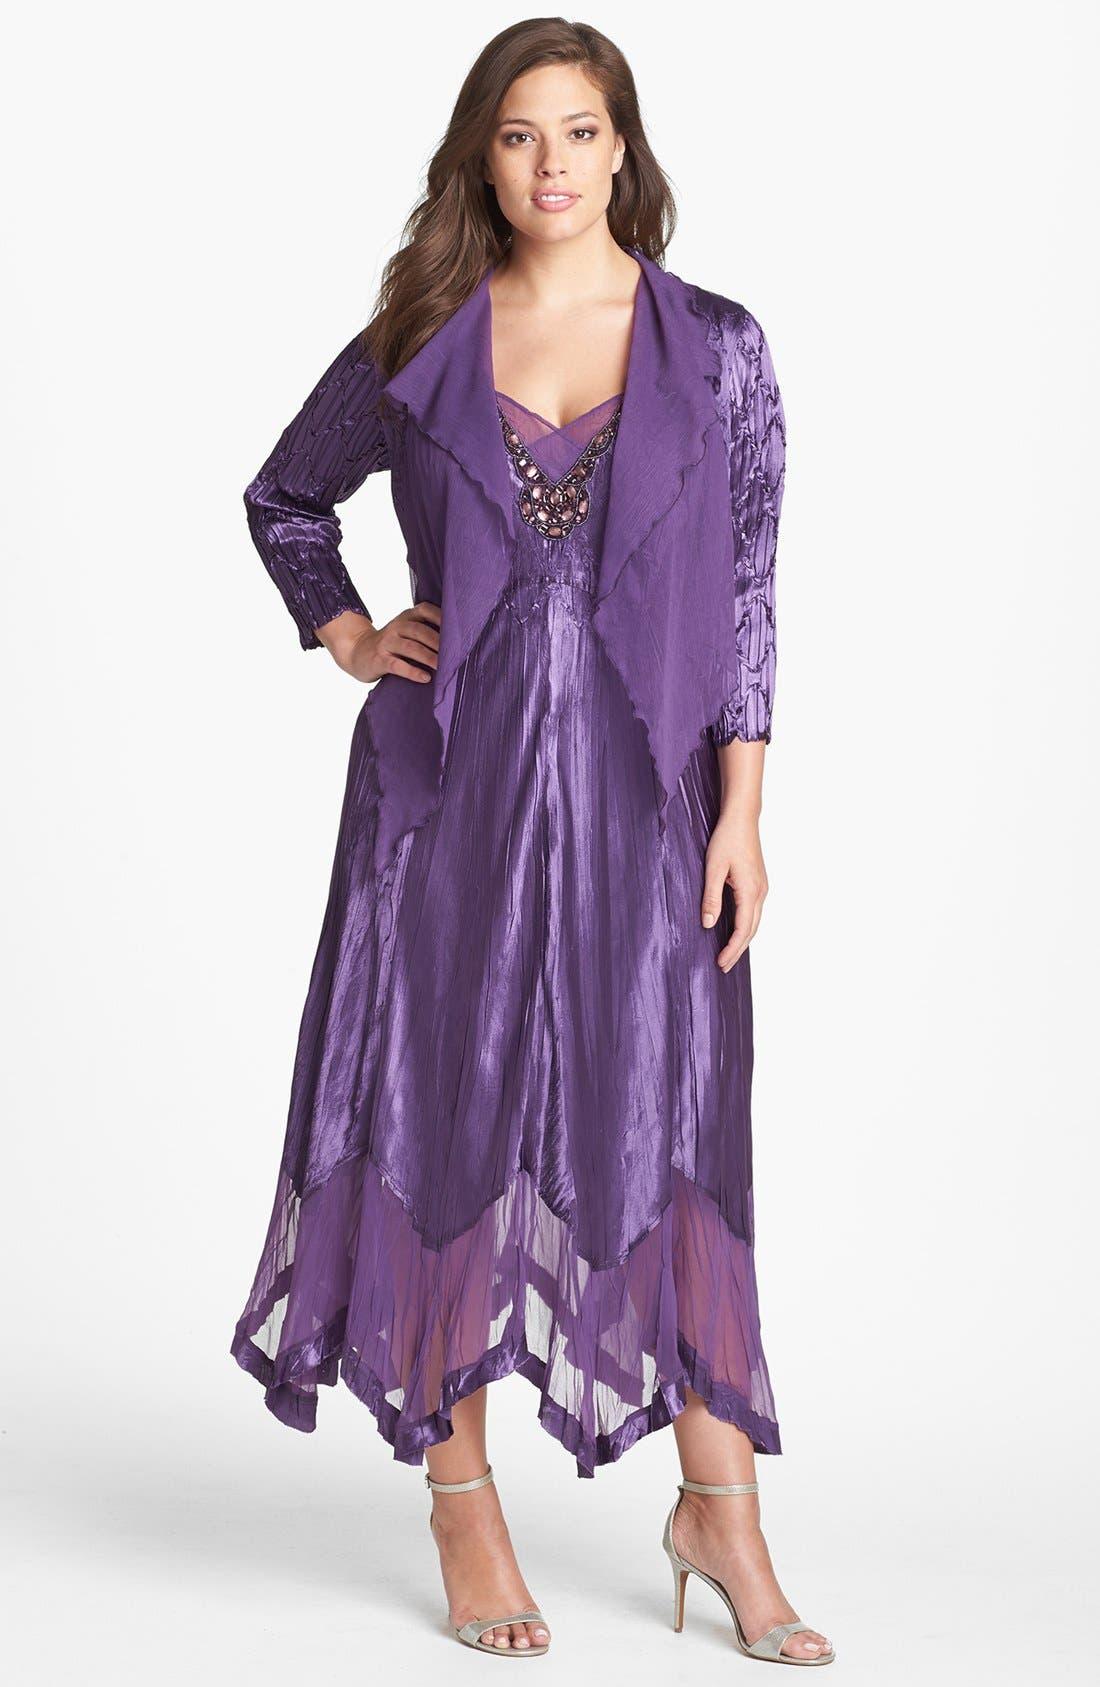 Alternate Image 1 Selected - Komarov Chiffon Trim Charmeuse Dress & Jacket (Plus Size)